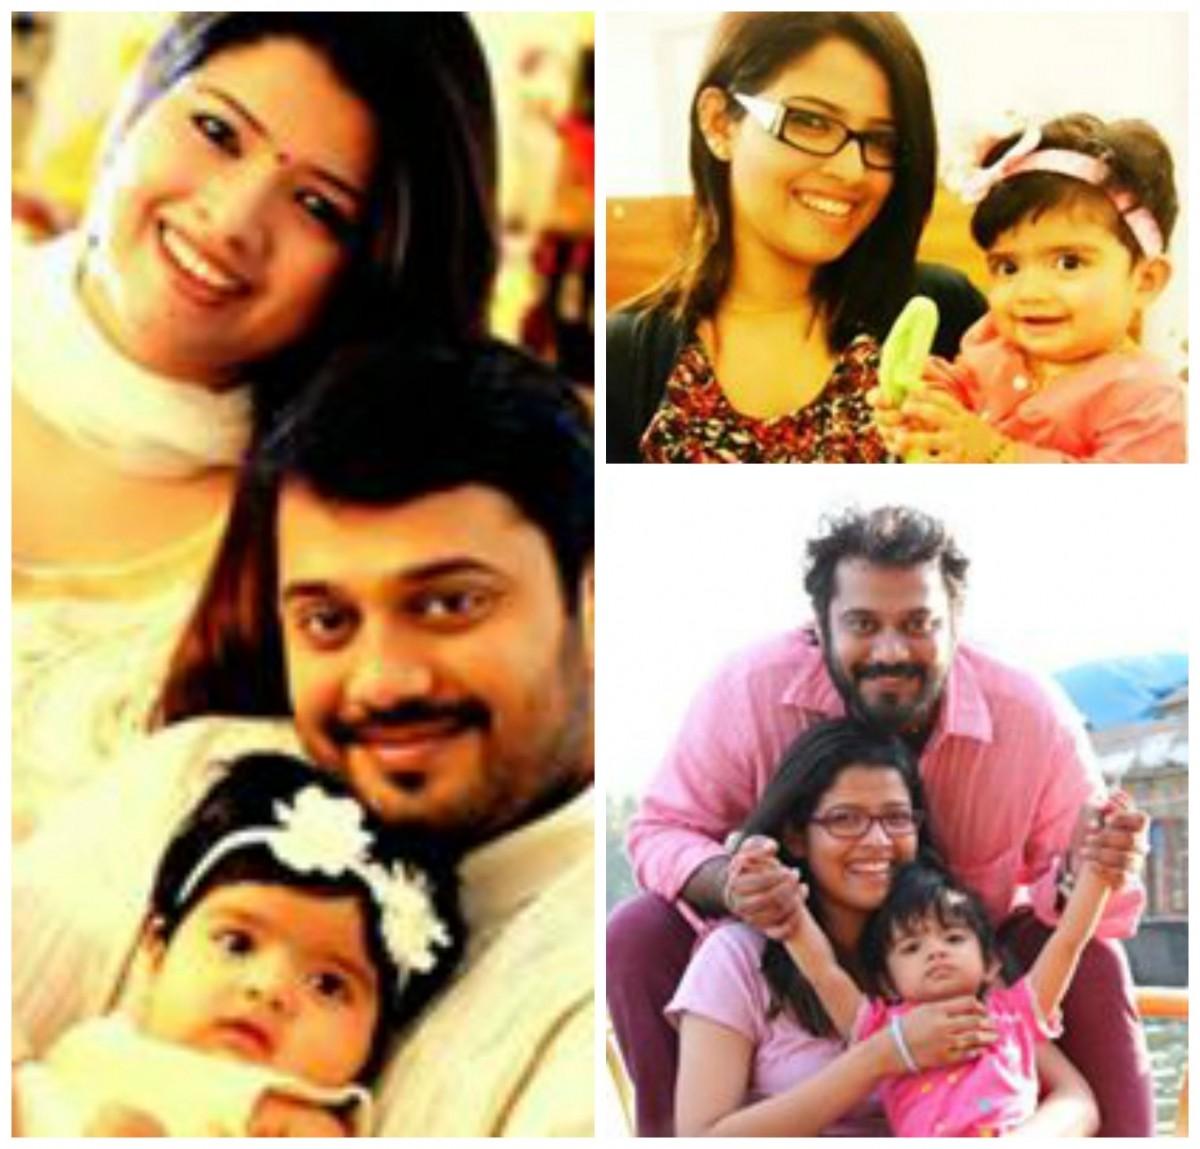 Bala and Amrutha Suresh with their daughter Avantika Kumar